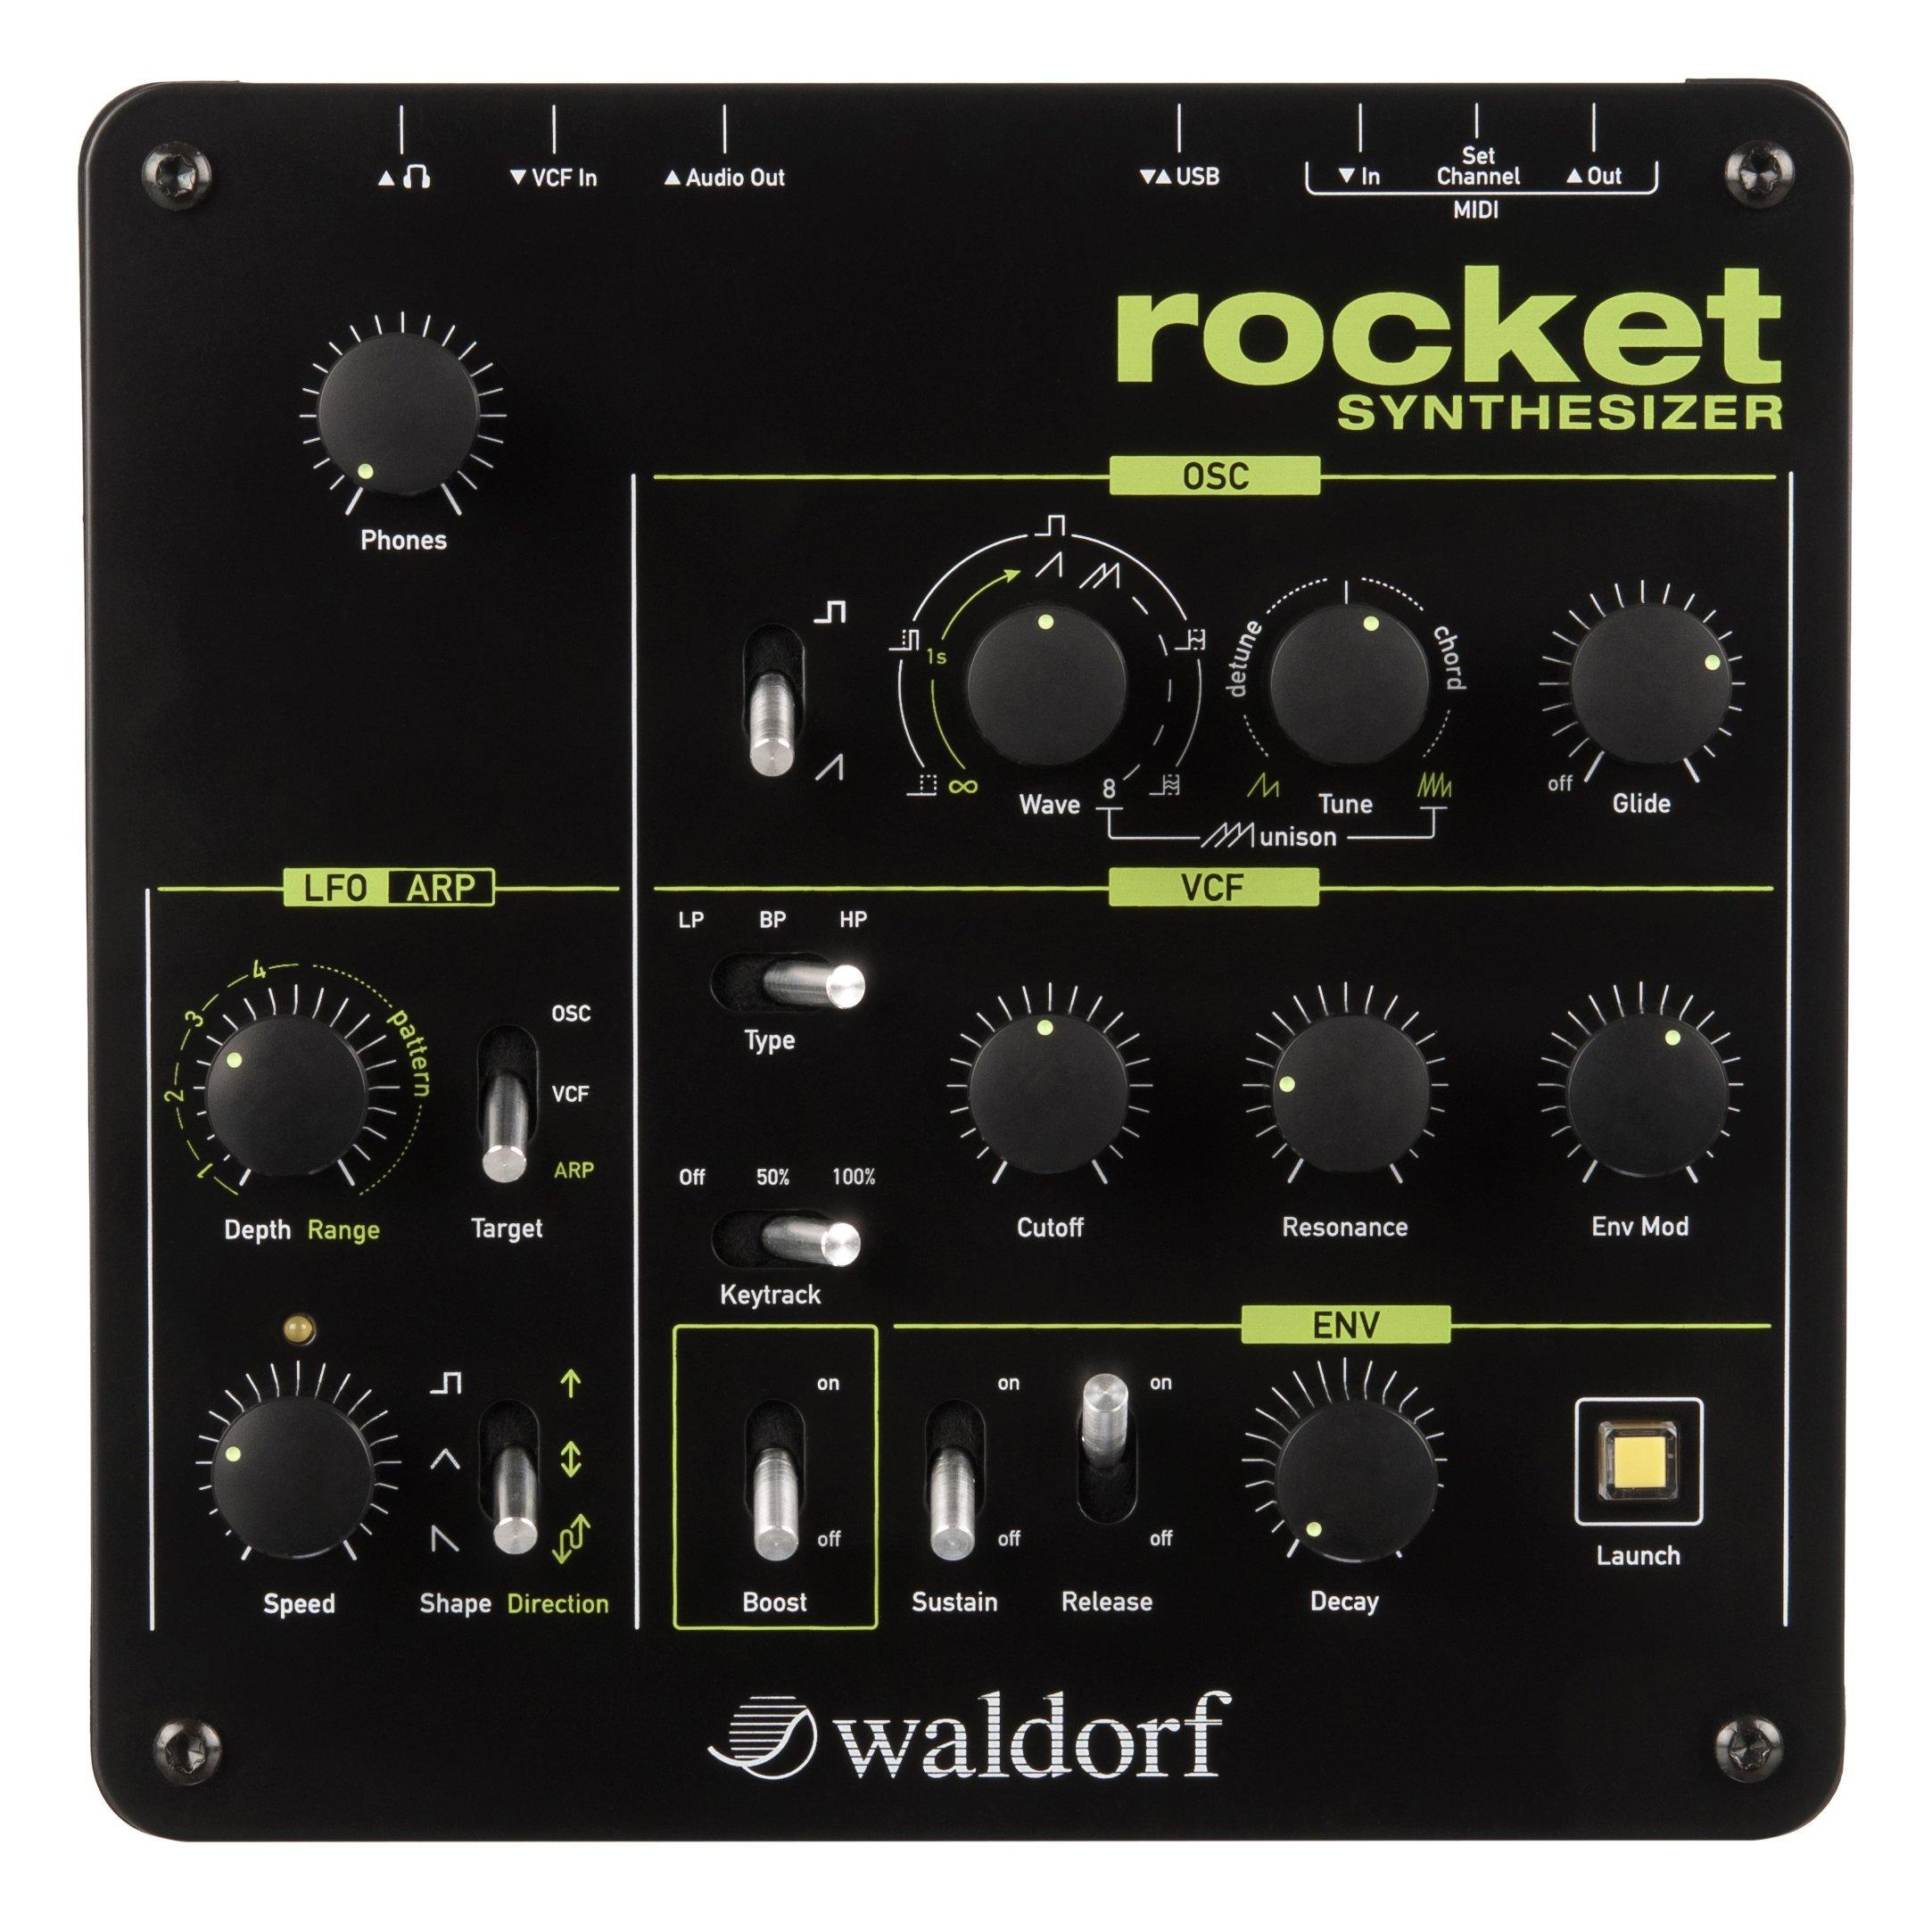 Waldorf WDF-RKT-1 Rocket Desktop Synthesizer by Waldorf